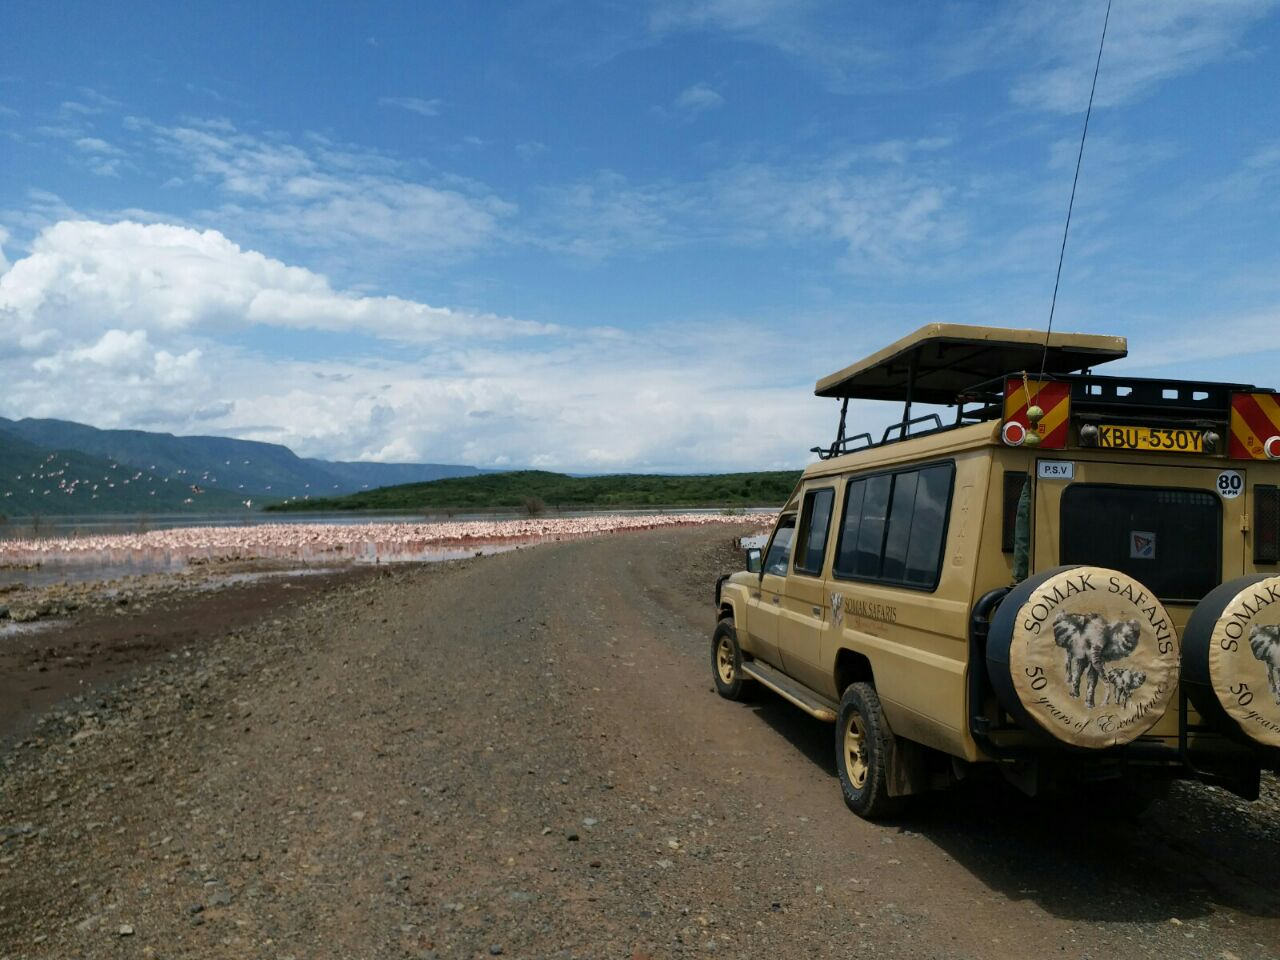 Somak safari vehicle